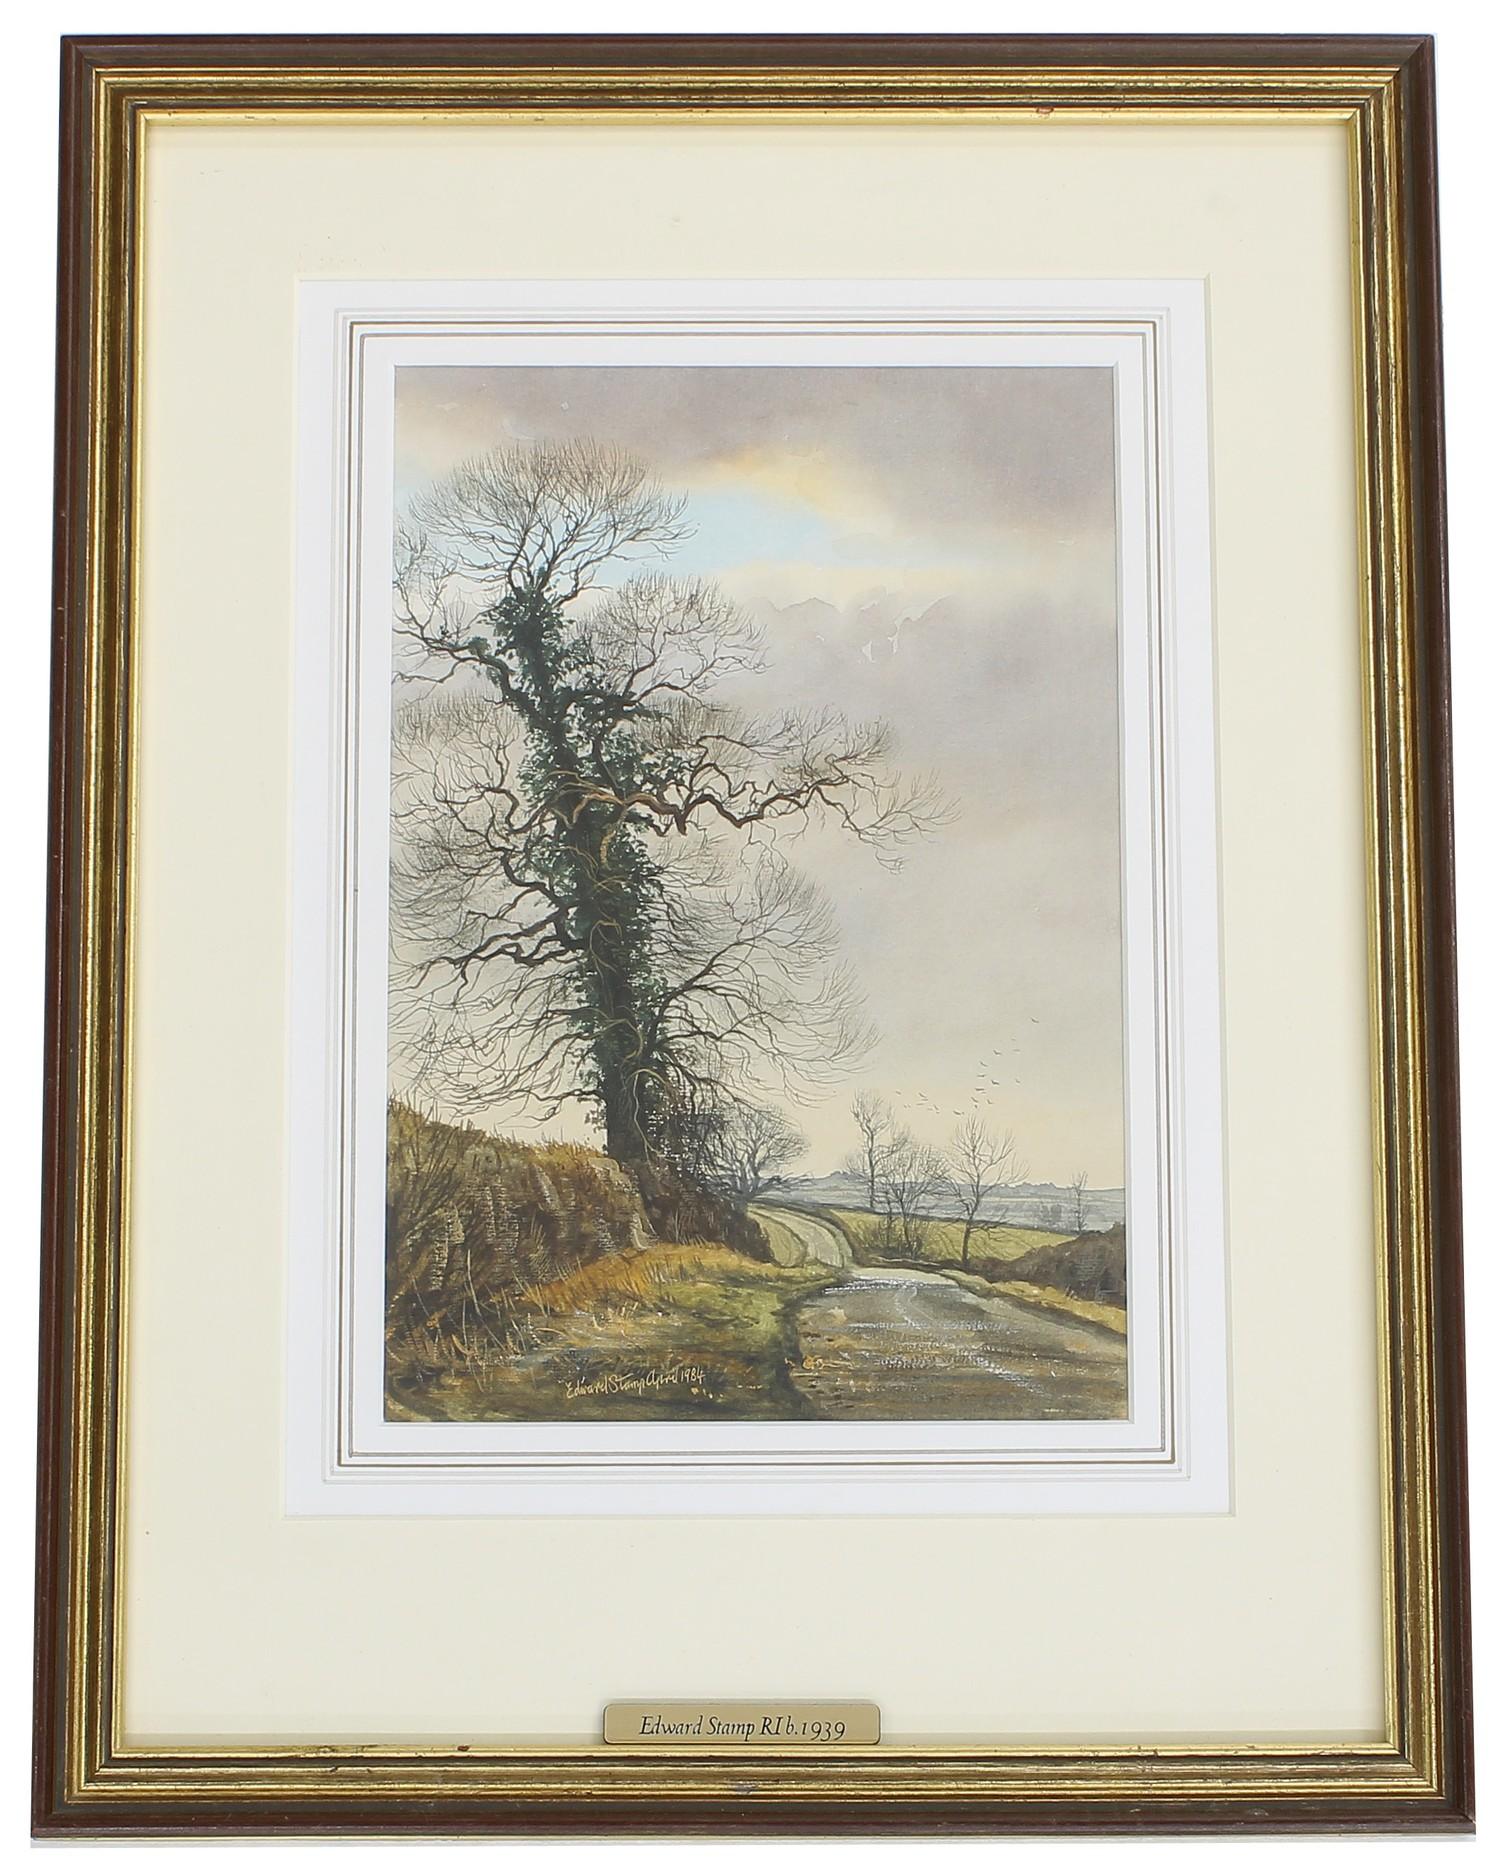 Edward Stamp RI (b. 1939) -'April Evening, Preston Bissett, Buckinghamshire', signed and dated 1984